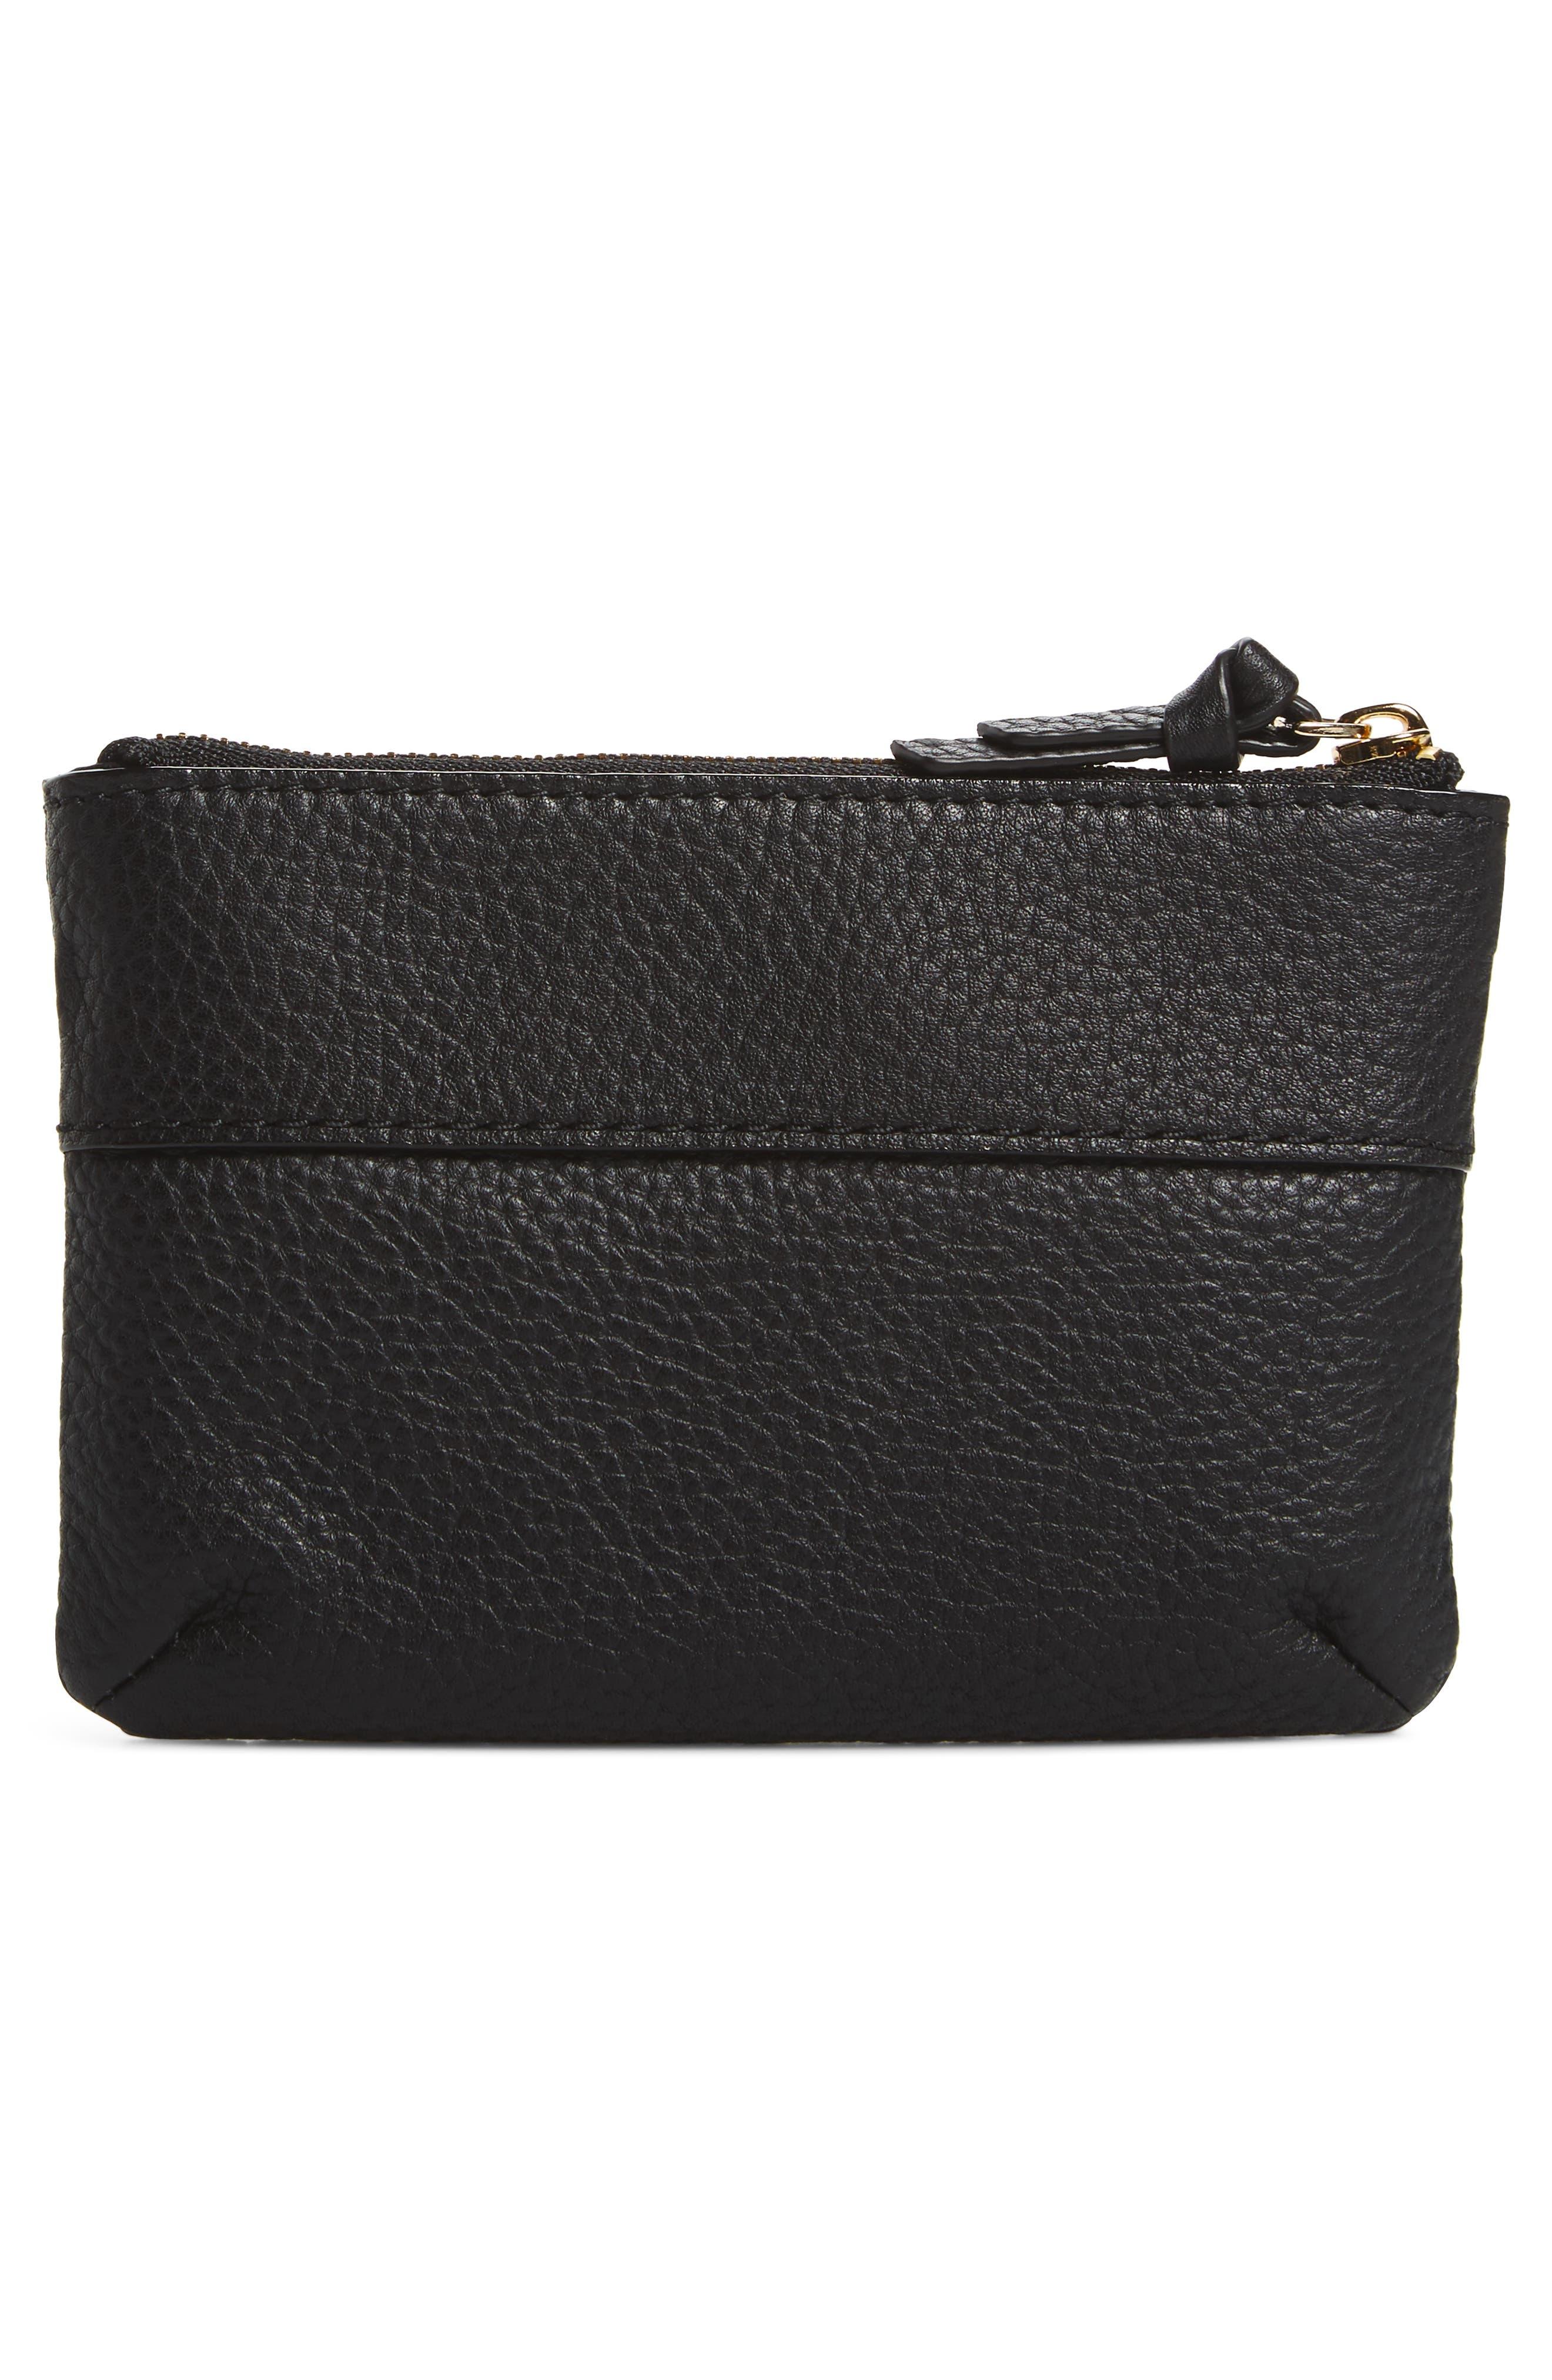 jackson street mila leather zip pouch,                             Alternate thumbnail 4, color,                             Black